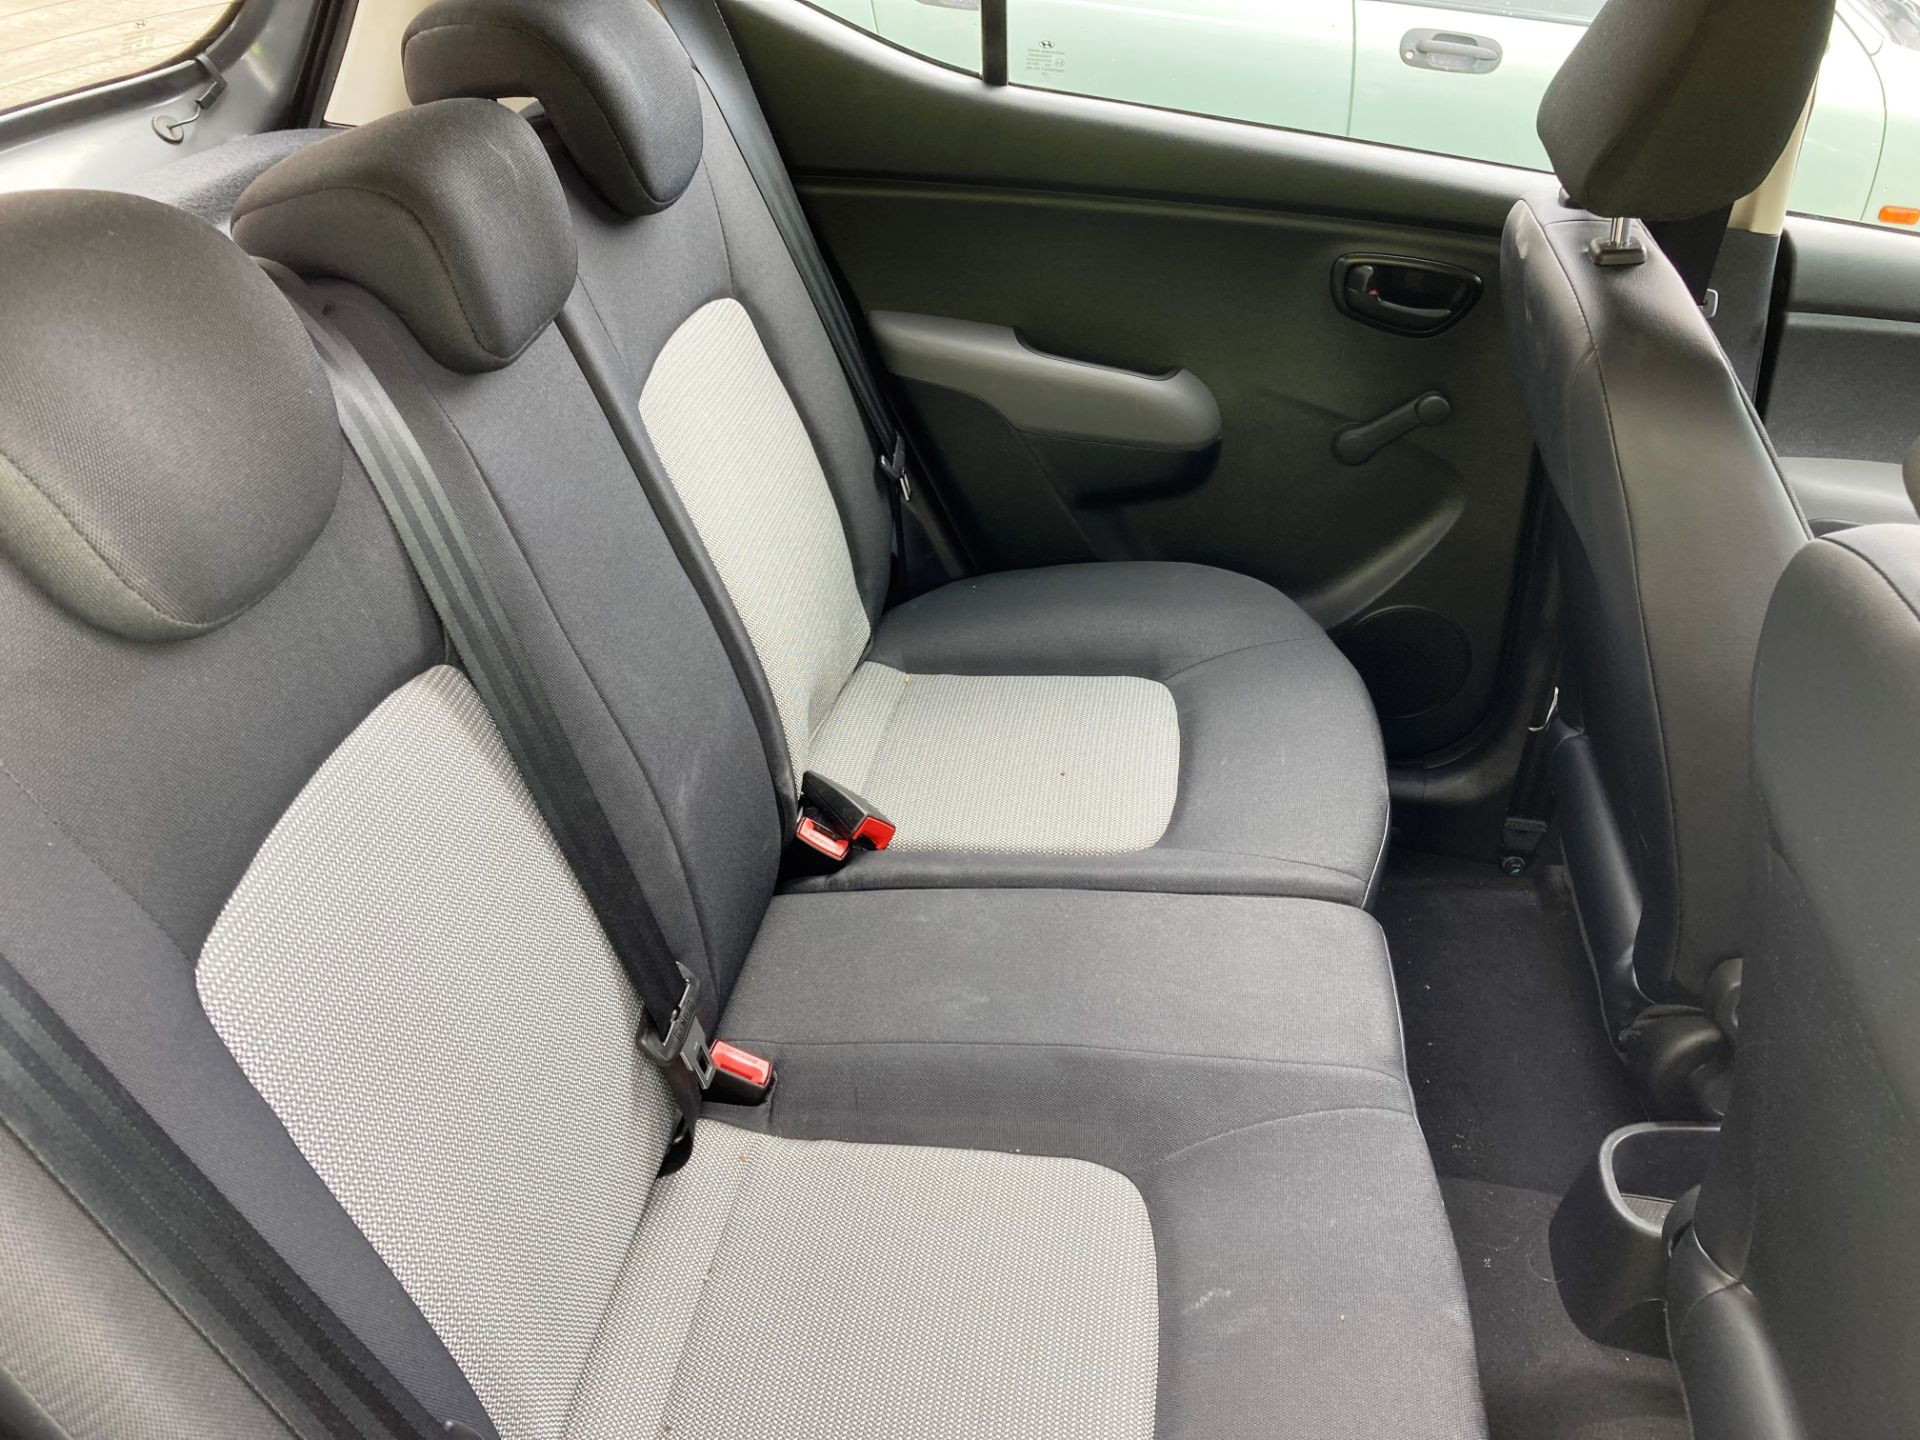 FROM A DECEASED ESTATE HYUNDAI i10 CLASSIC 5 door hatchback (1248cc) - petrol - grey Reg No: YR59 - Image 6 of 8